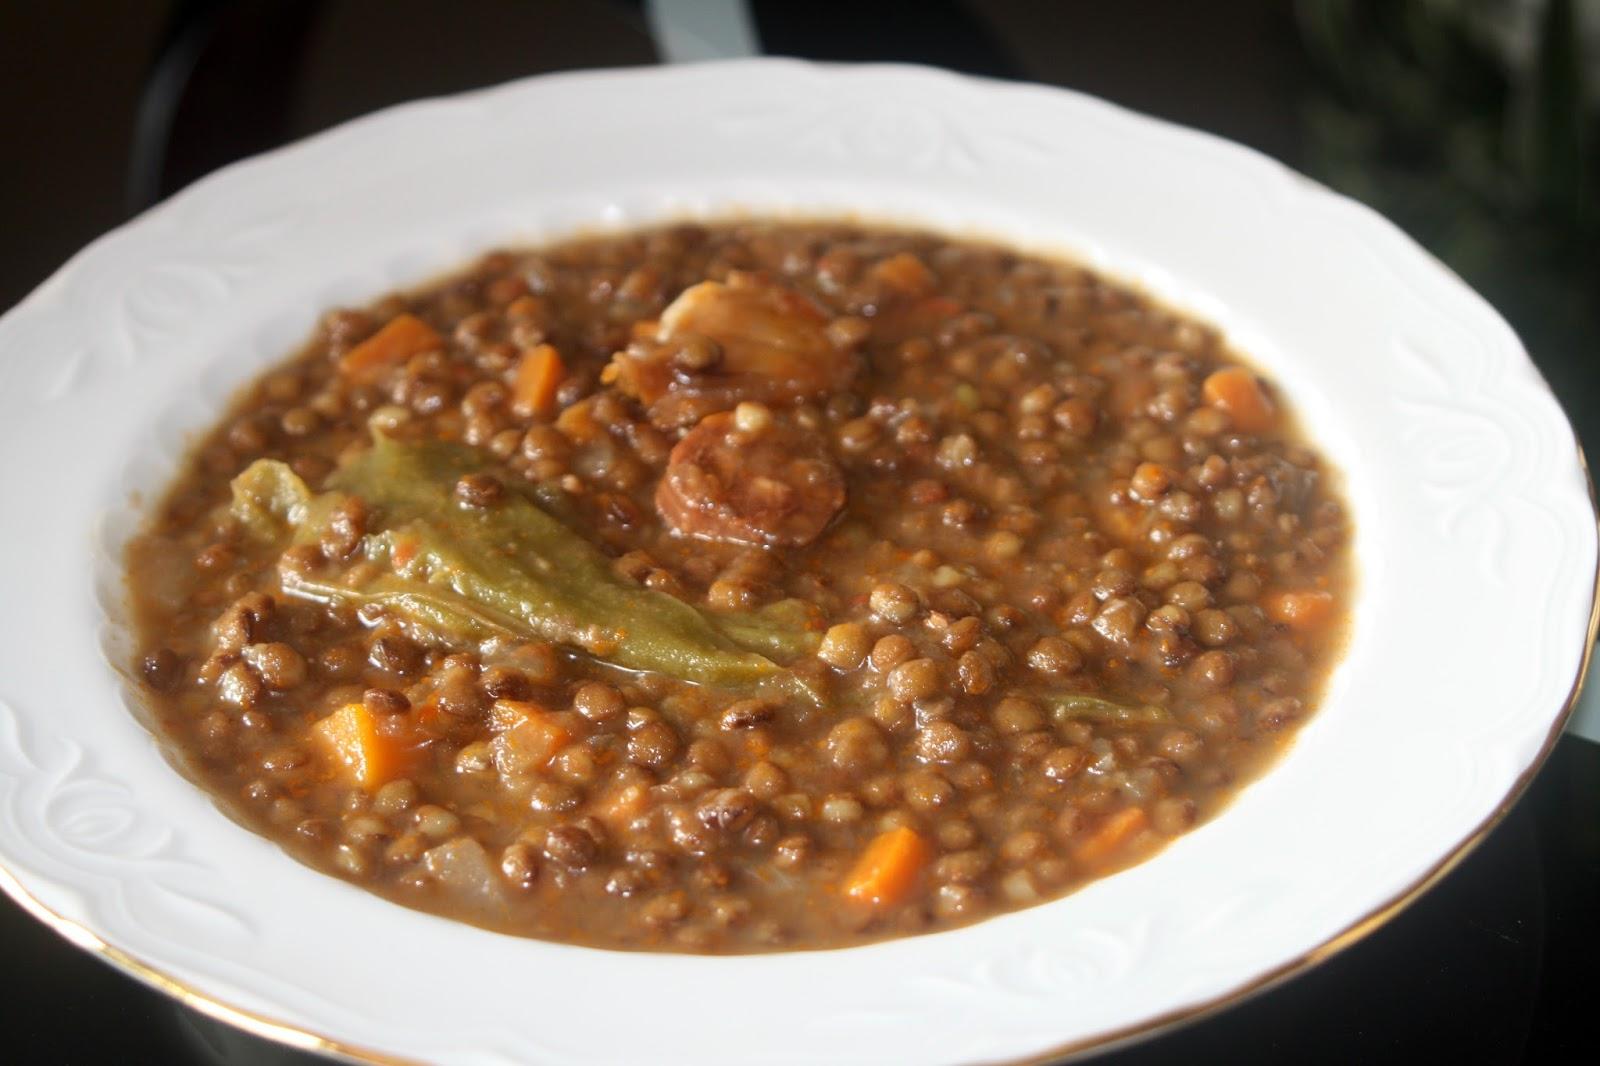 Alocados en la cocina receta de lentejas tradicional en - Garbanzos olla express ...